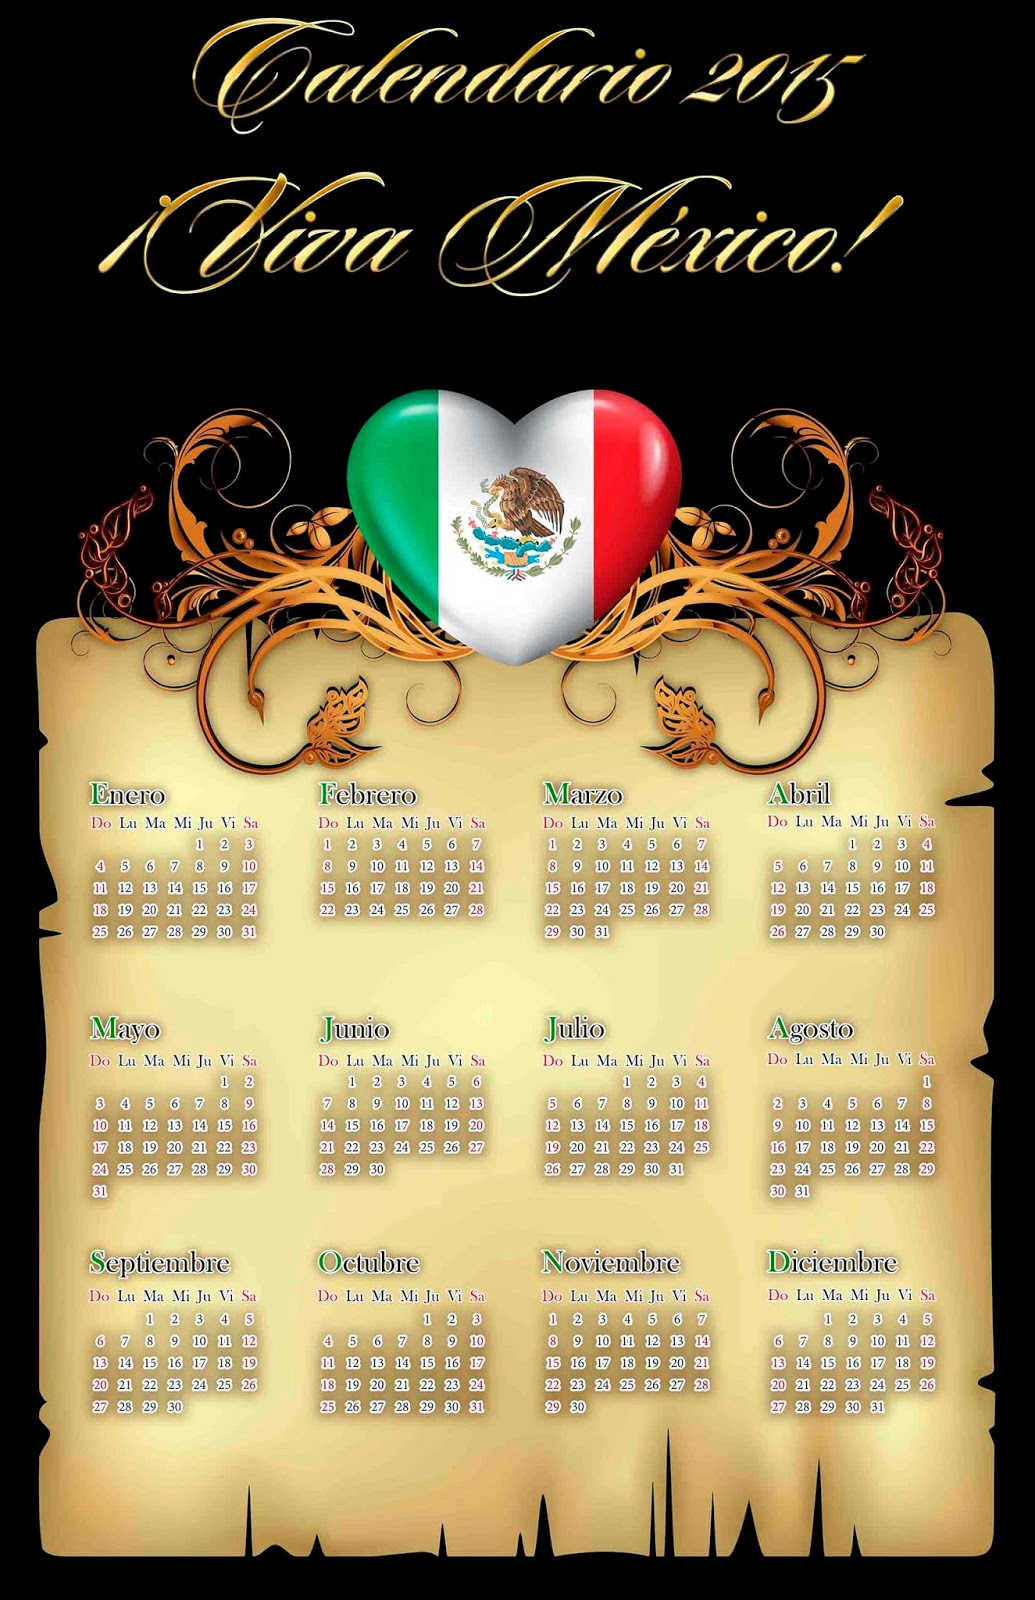 Pergamino en fondo negro con escudo de México y un calendario 2015